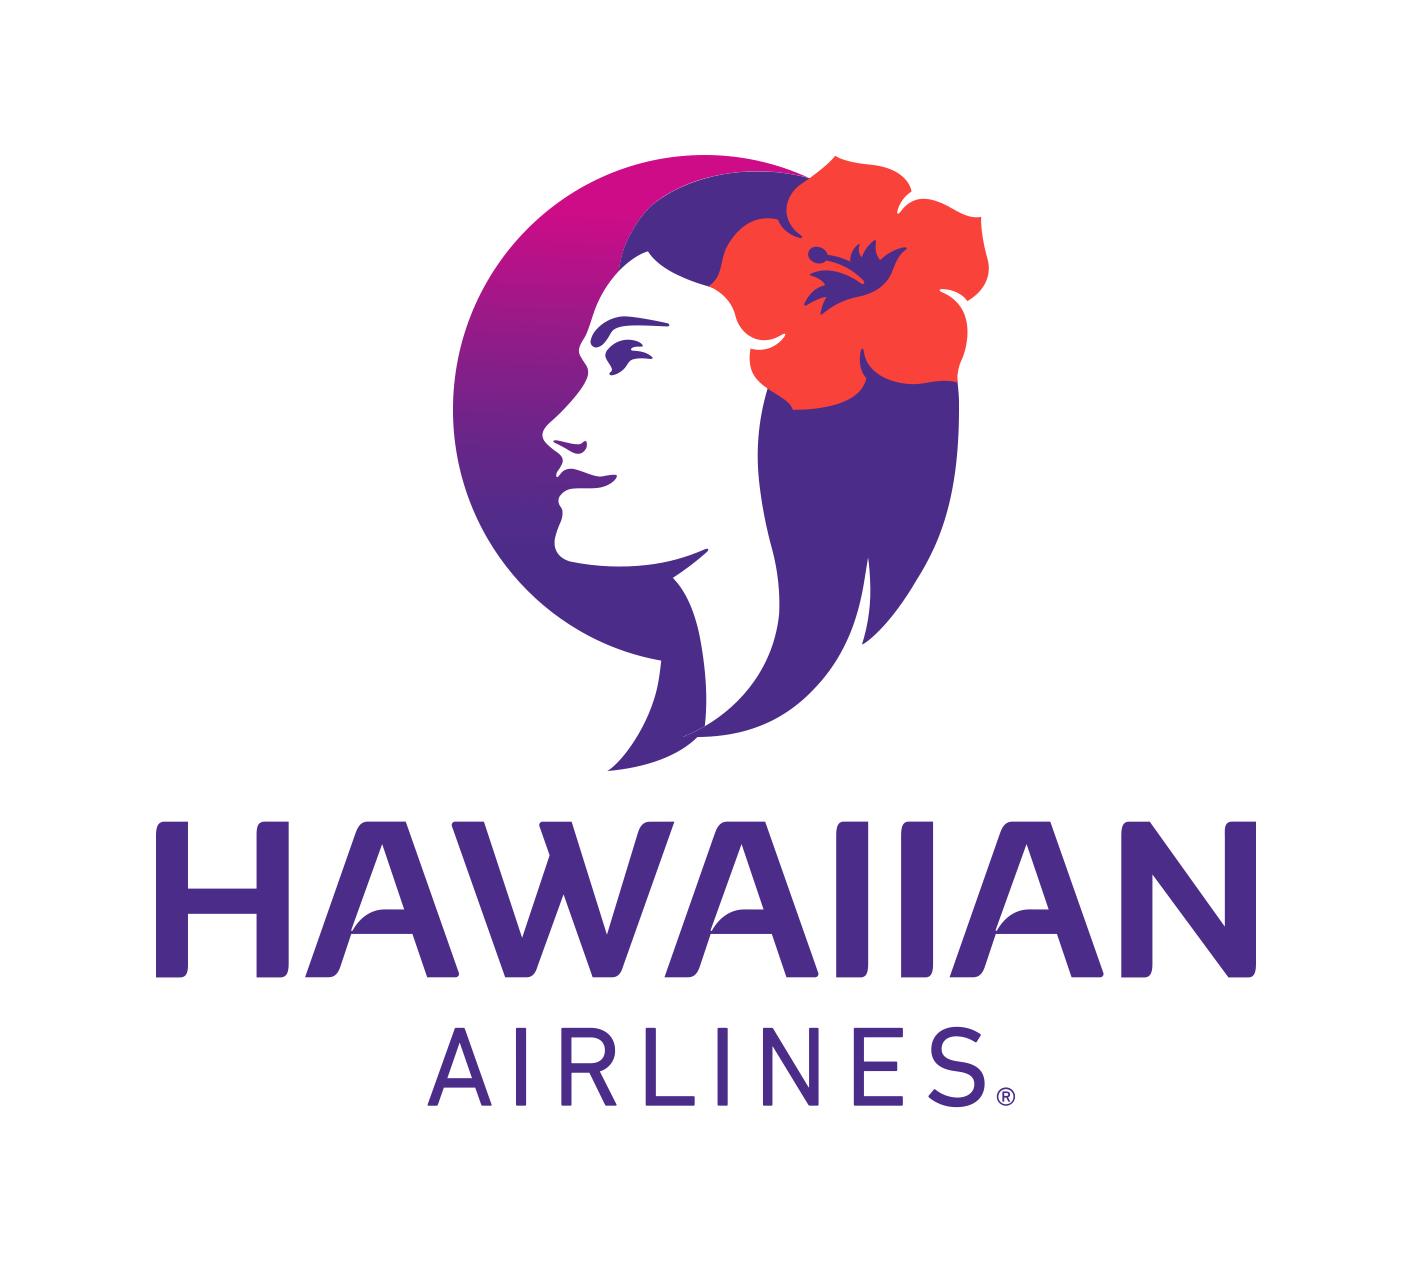 Hawaiian Airlines.png